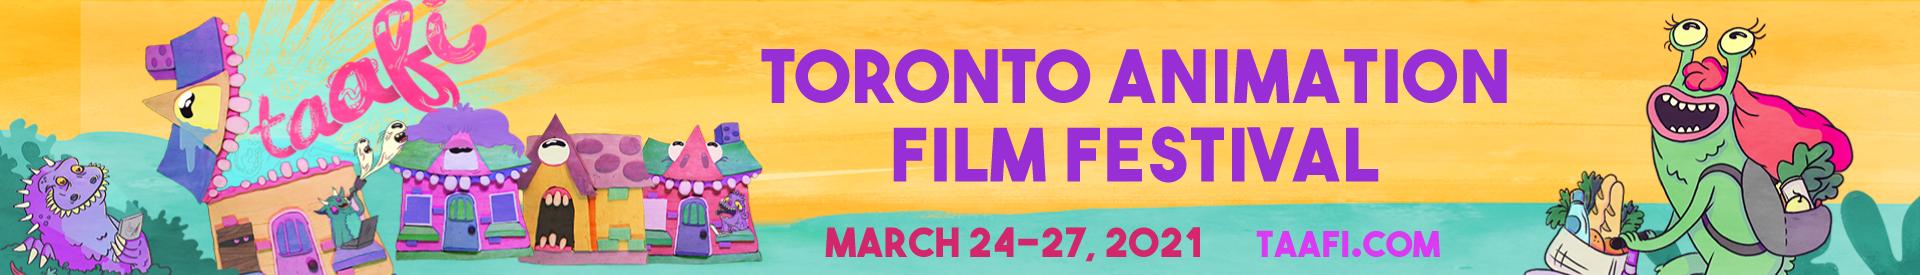 Toronto Animation Film Festival 2021